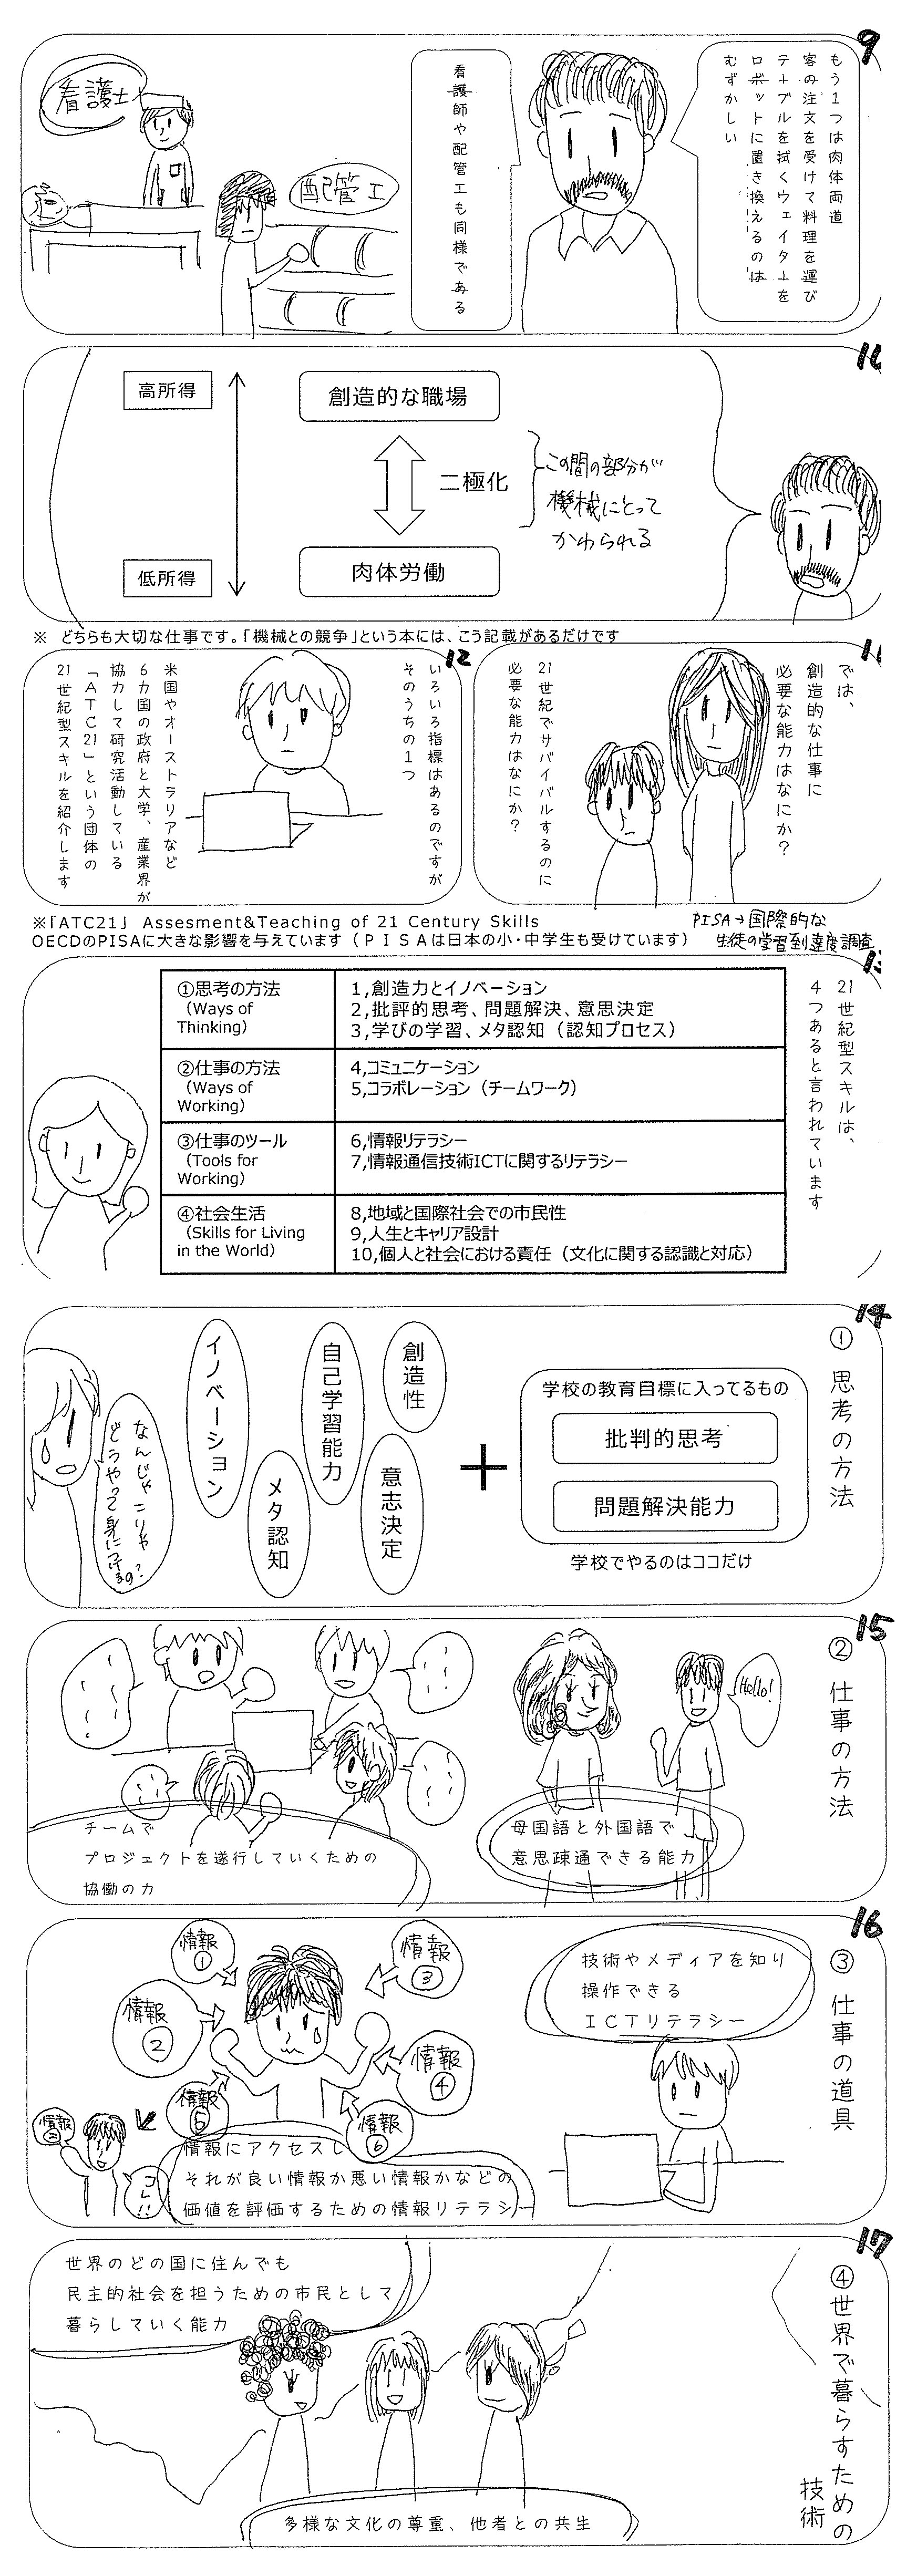 http://www.cobon.jp/news/%E6%BC%AB%E7%94%BB%E5%A4%89%E6%8F%9B2.jpg